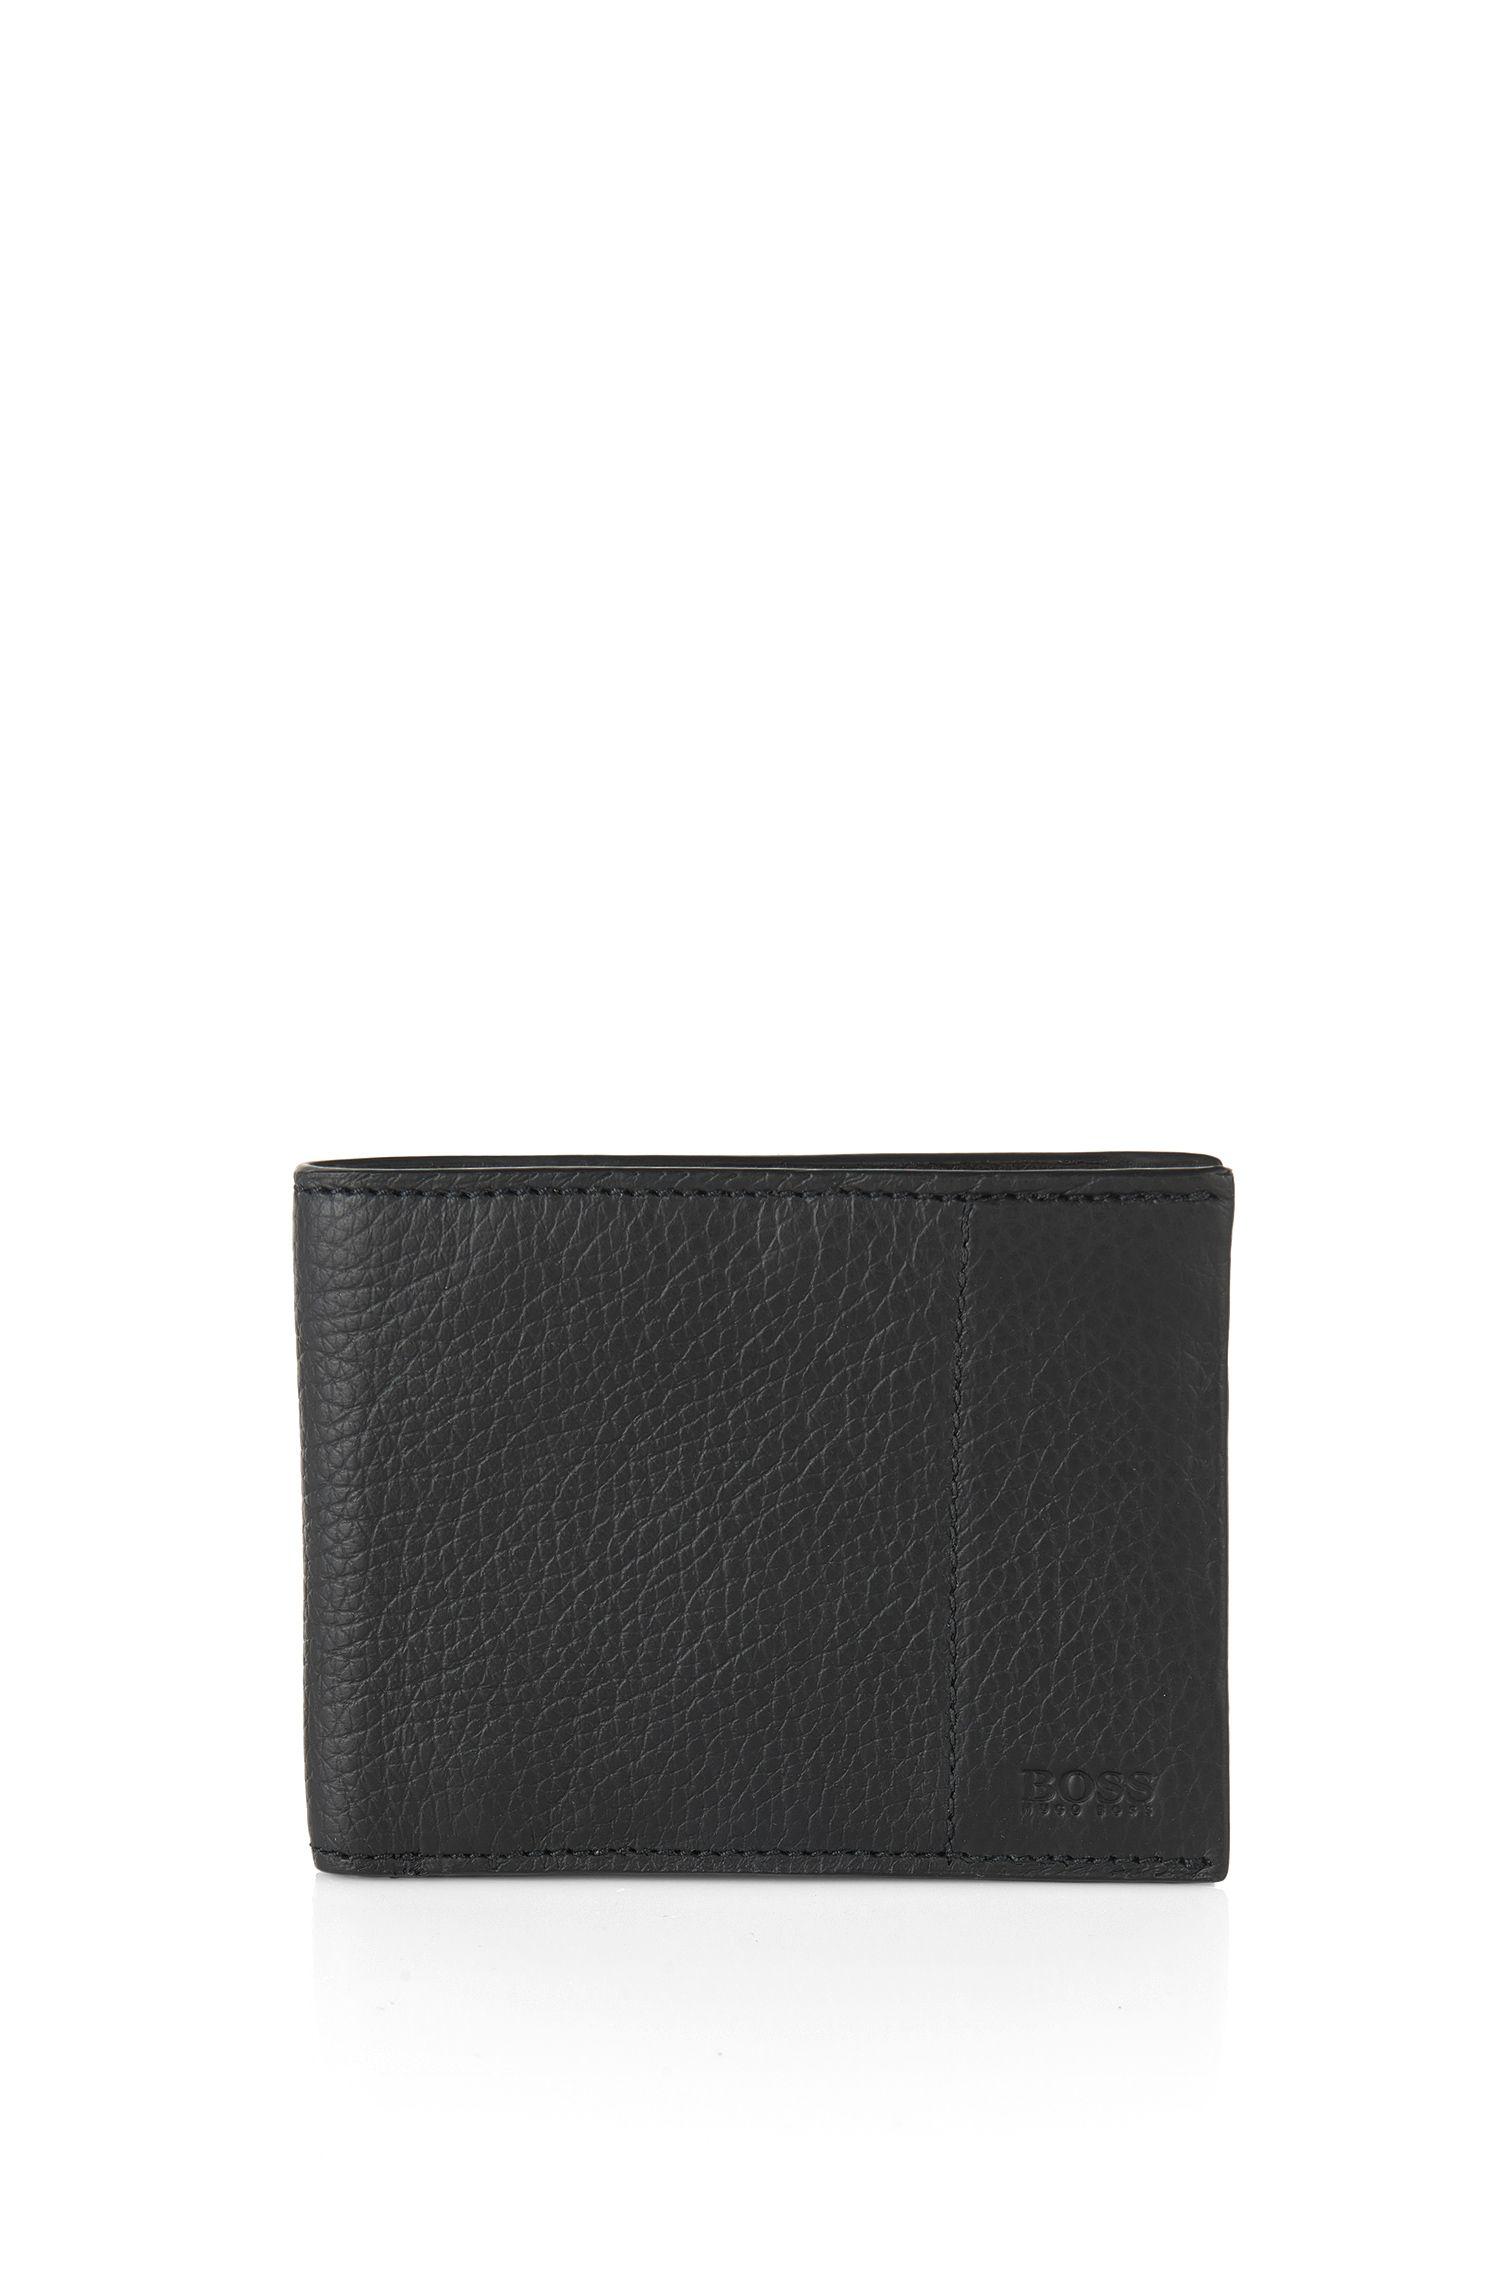 Leather Billfold Wallet   Traveller 6 CC